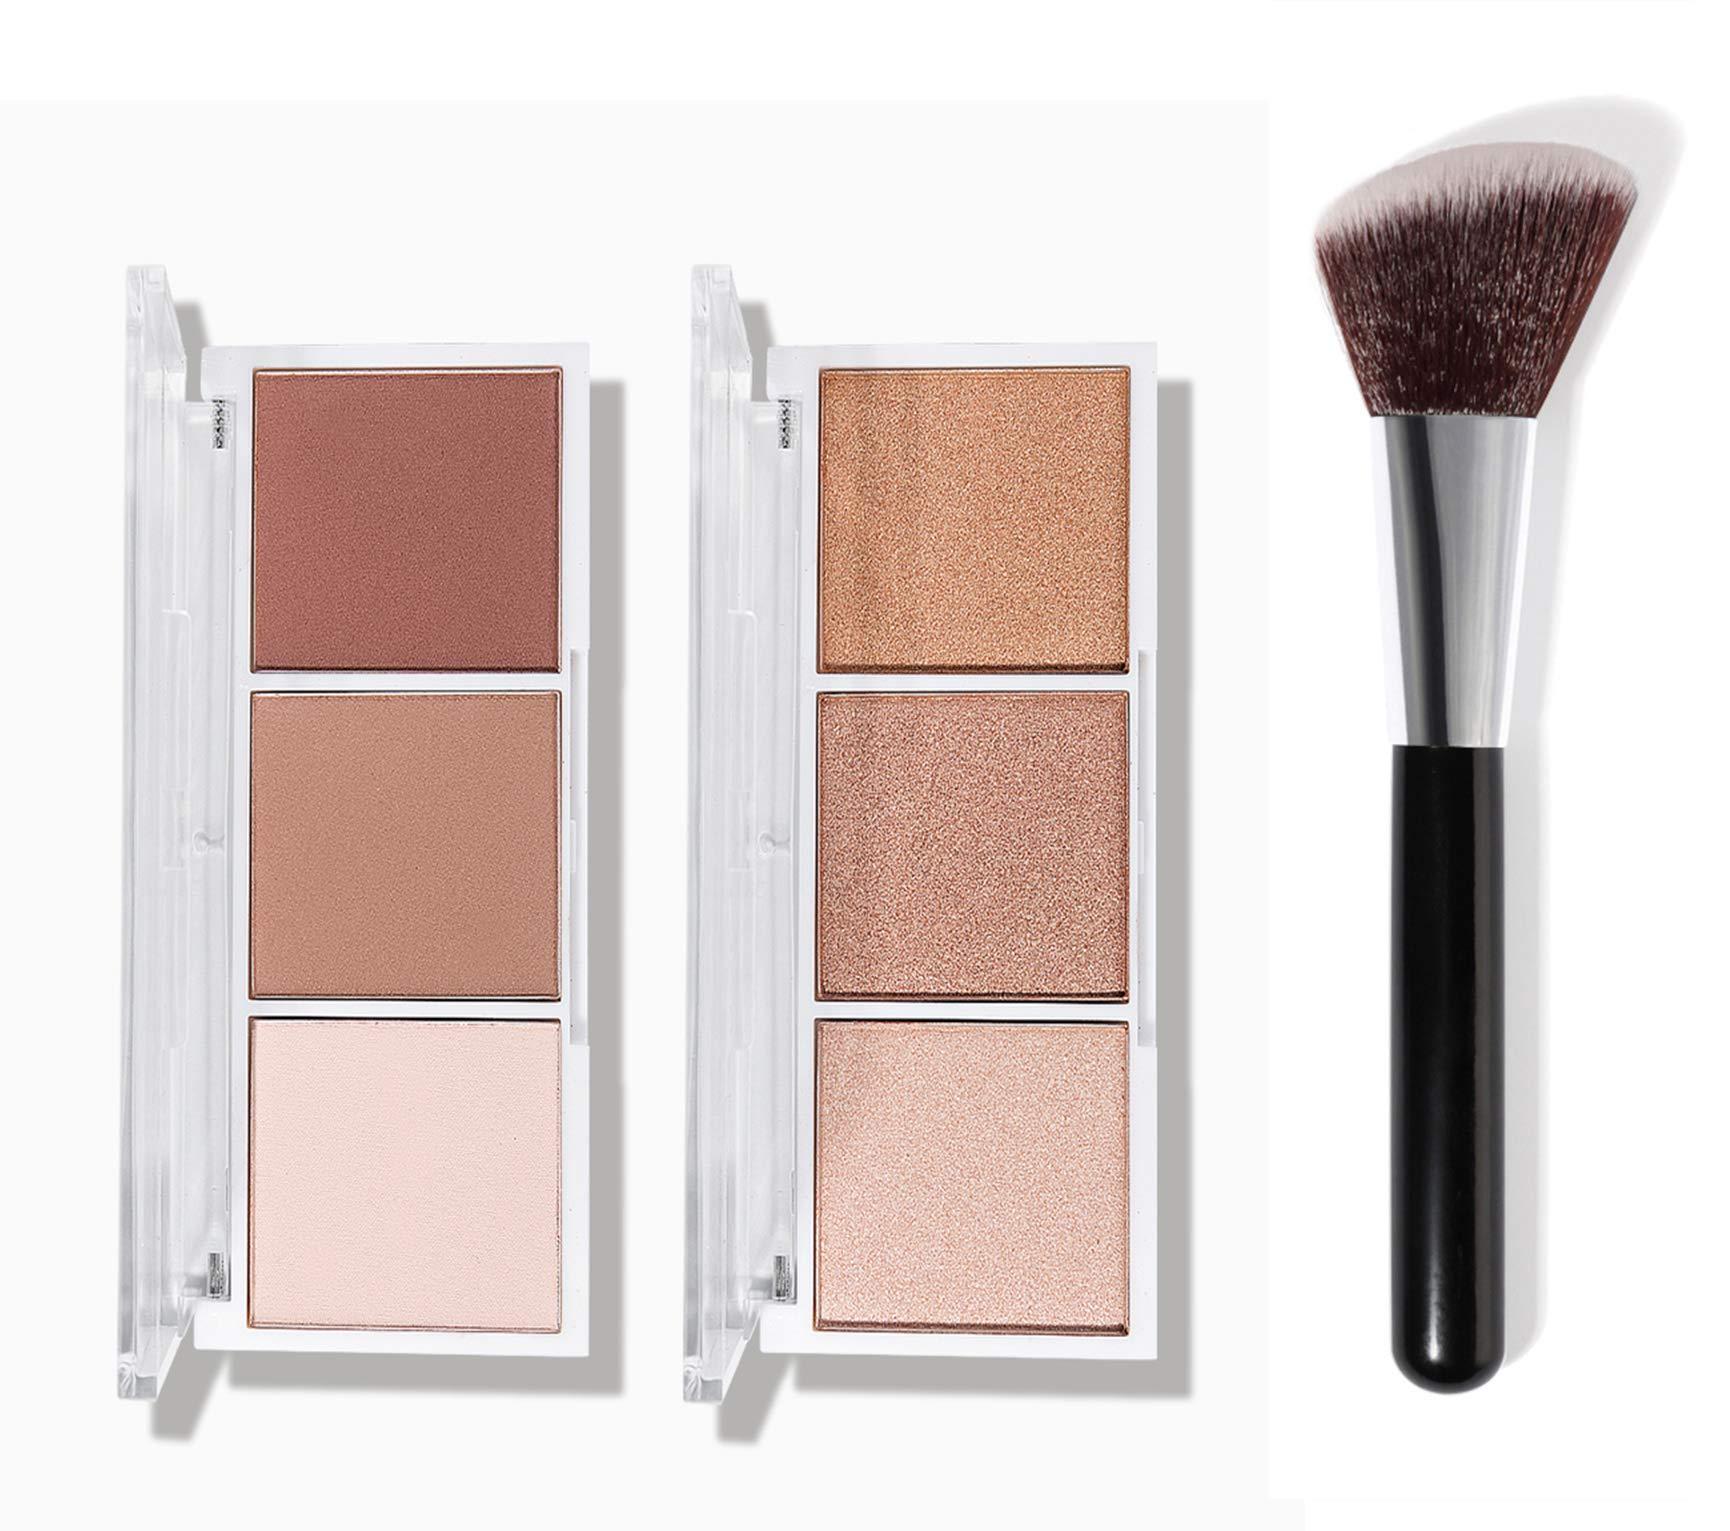 2 Pack Highlighter Palette with Brush, Highlighter Makeup Palette, Glow Bronzer Highlighter Powder Kit, Face Illuminator Makeup Palette, for Bronzer Cheekbones (Set A)